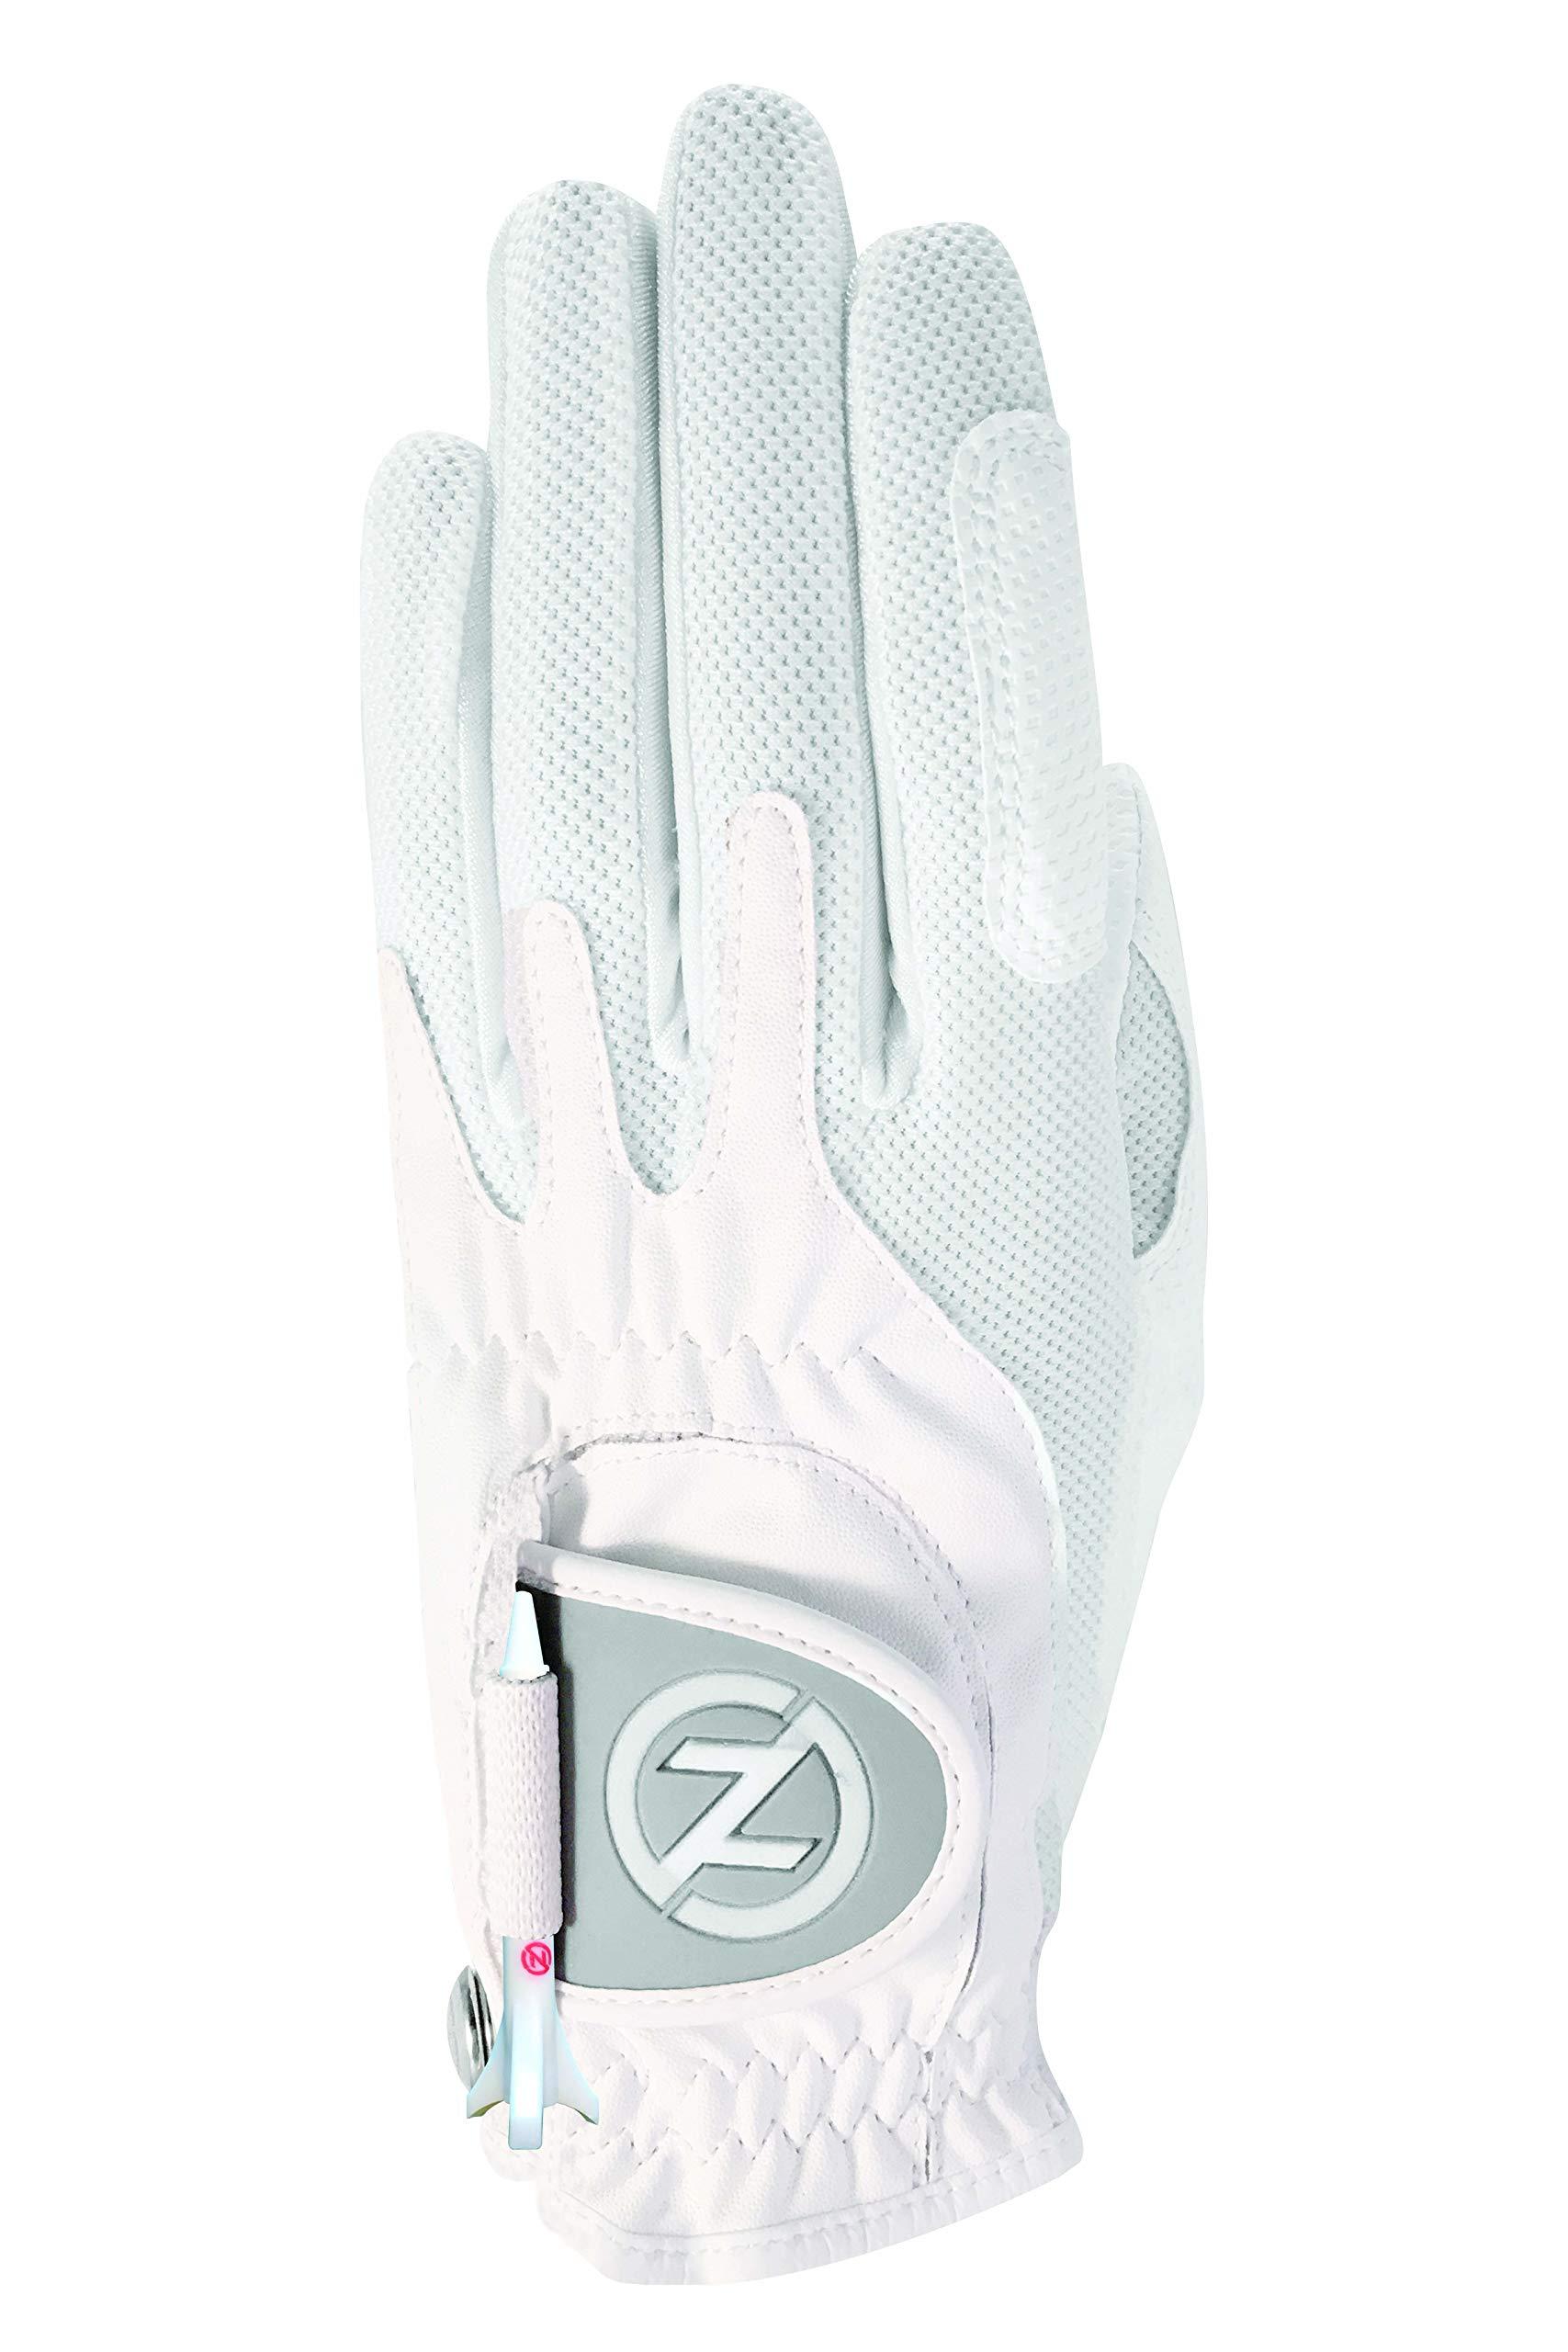 Zero Friction Women's Golf Gloves, Left Hand, One